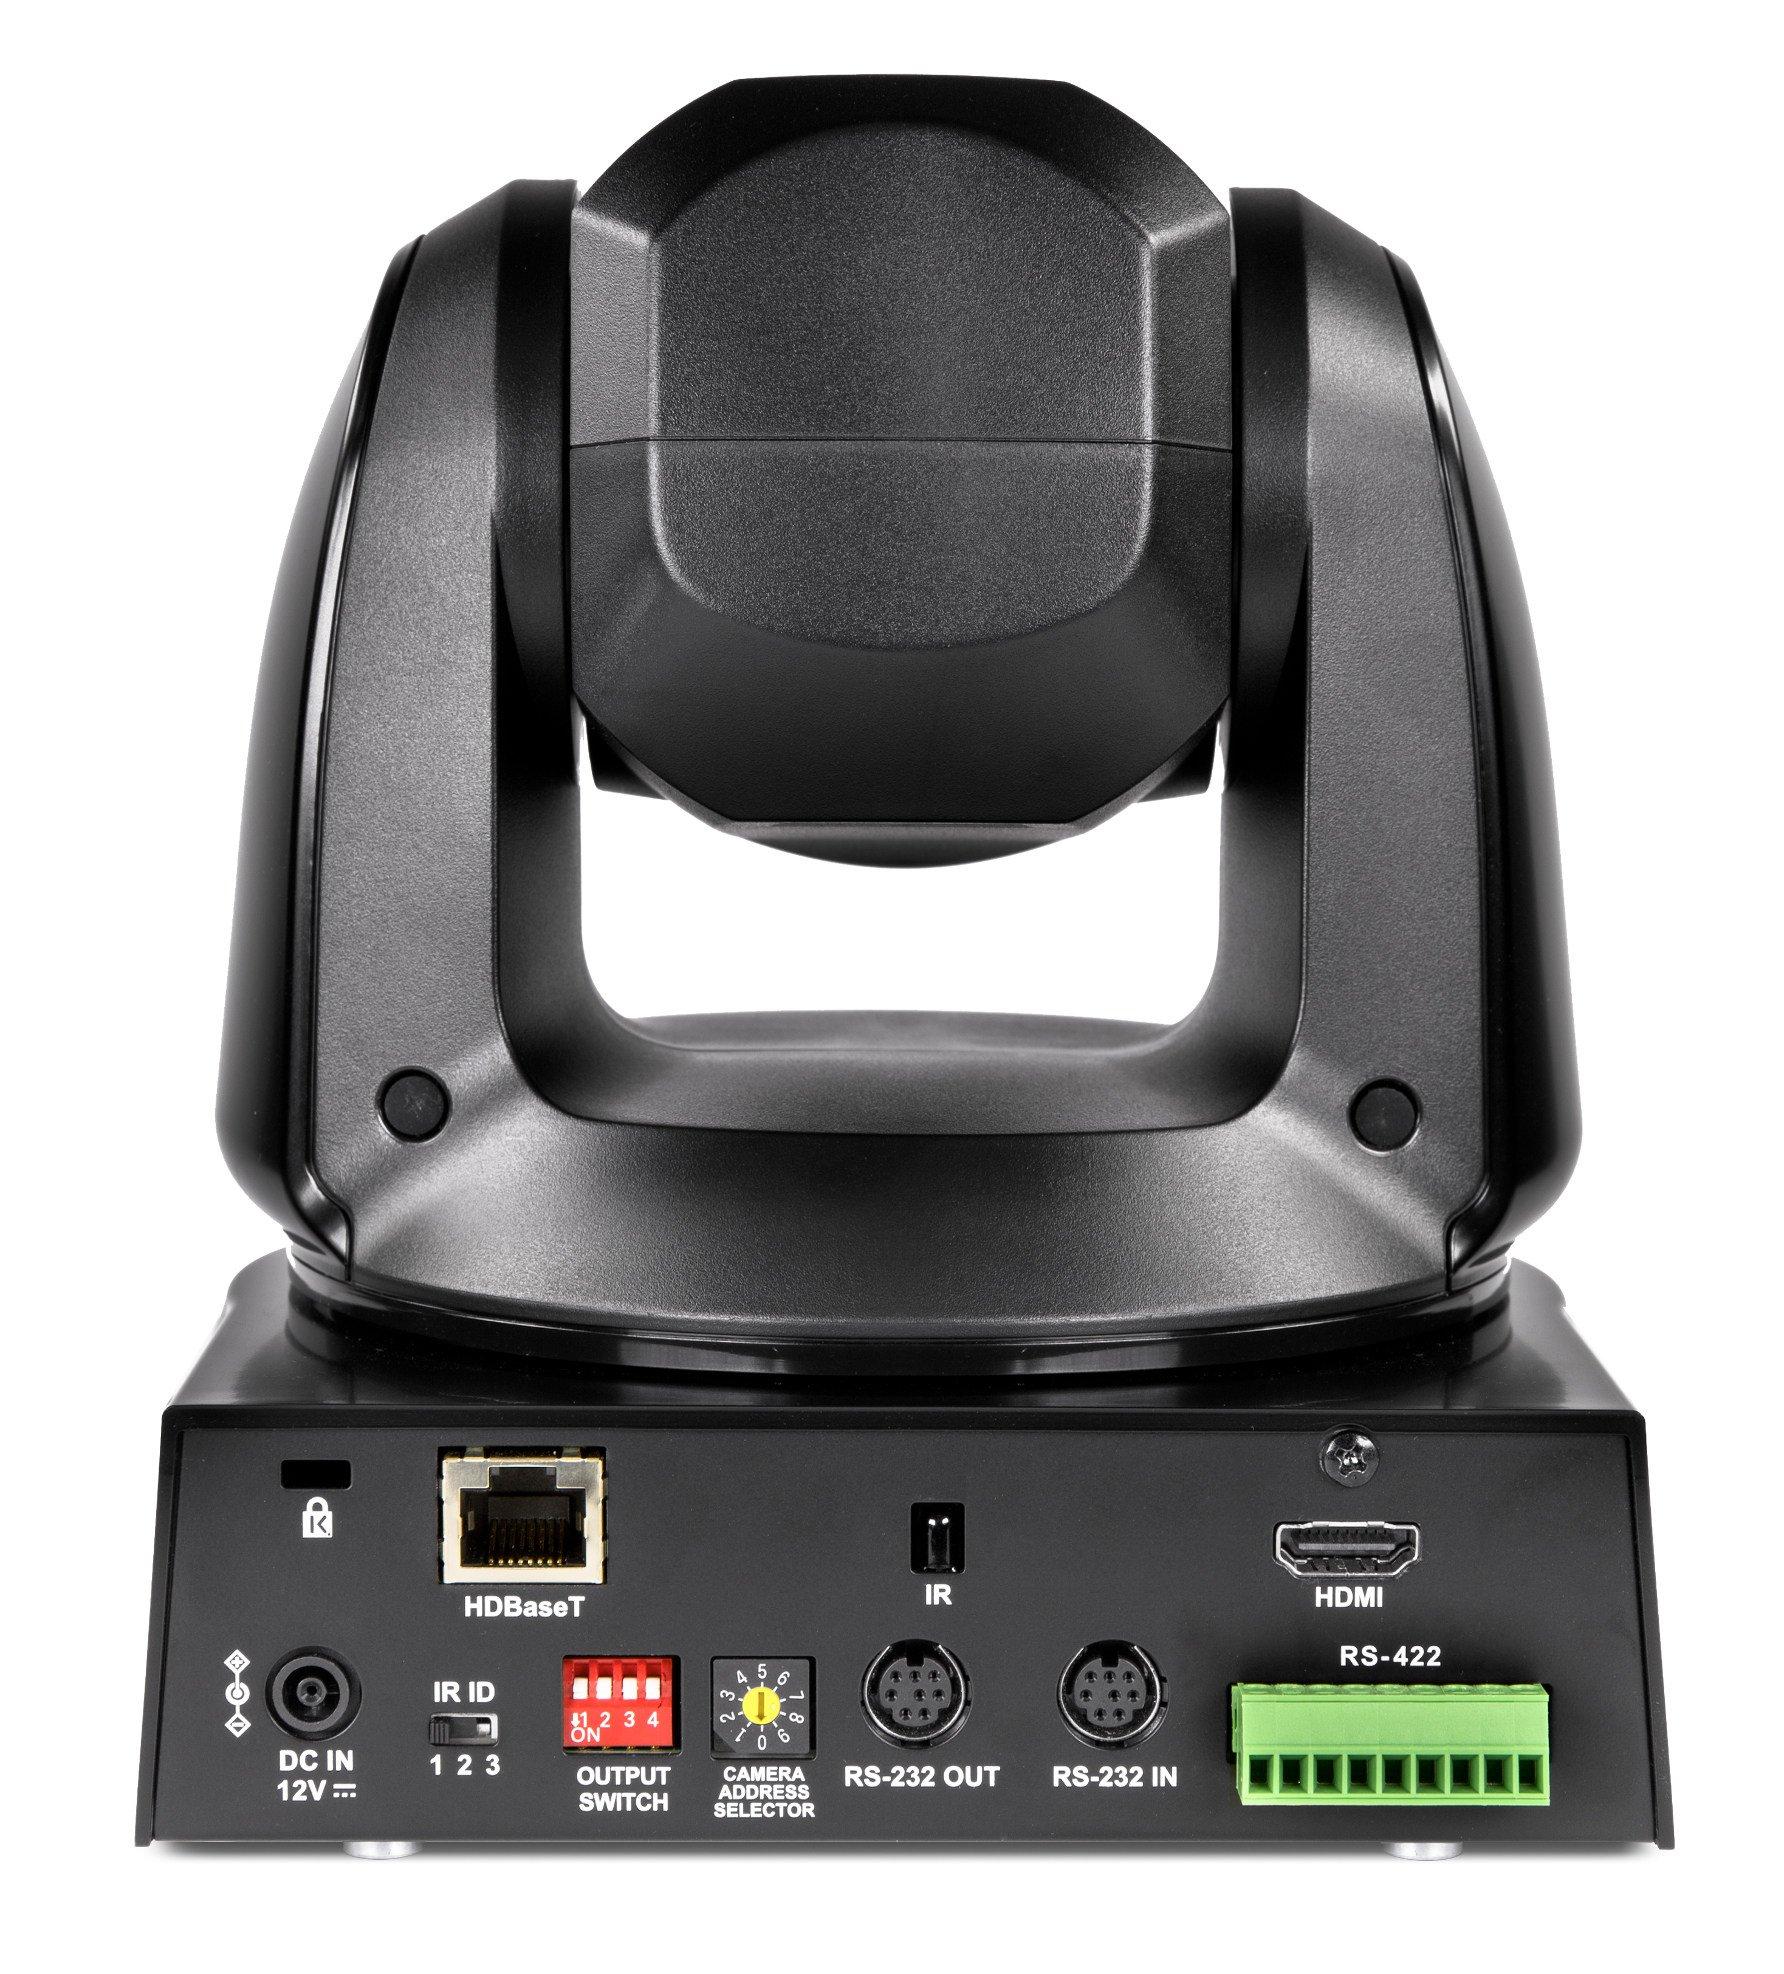 4K HDBaseT and HDMI PTZ 12x Optical Zoom Camera in Black